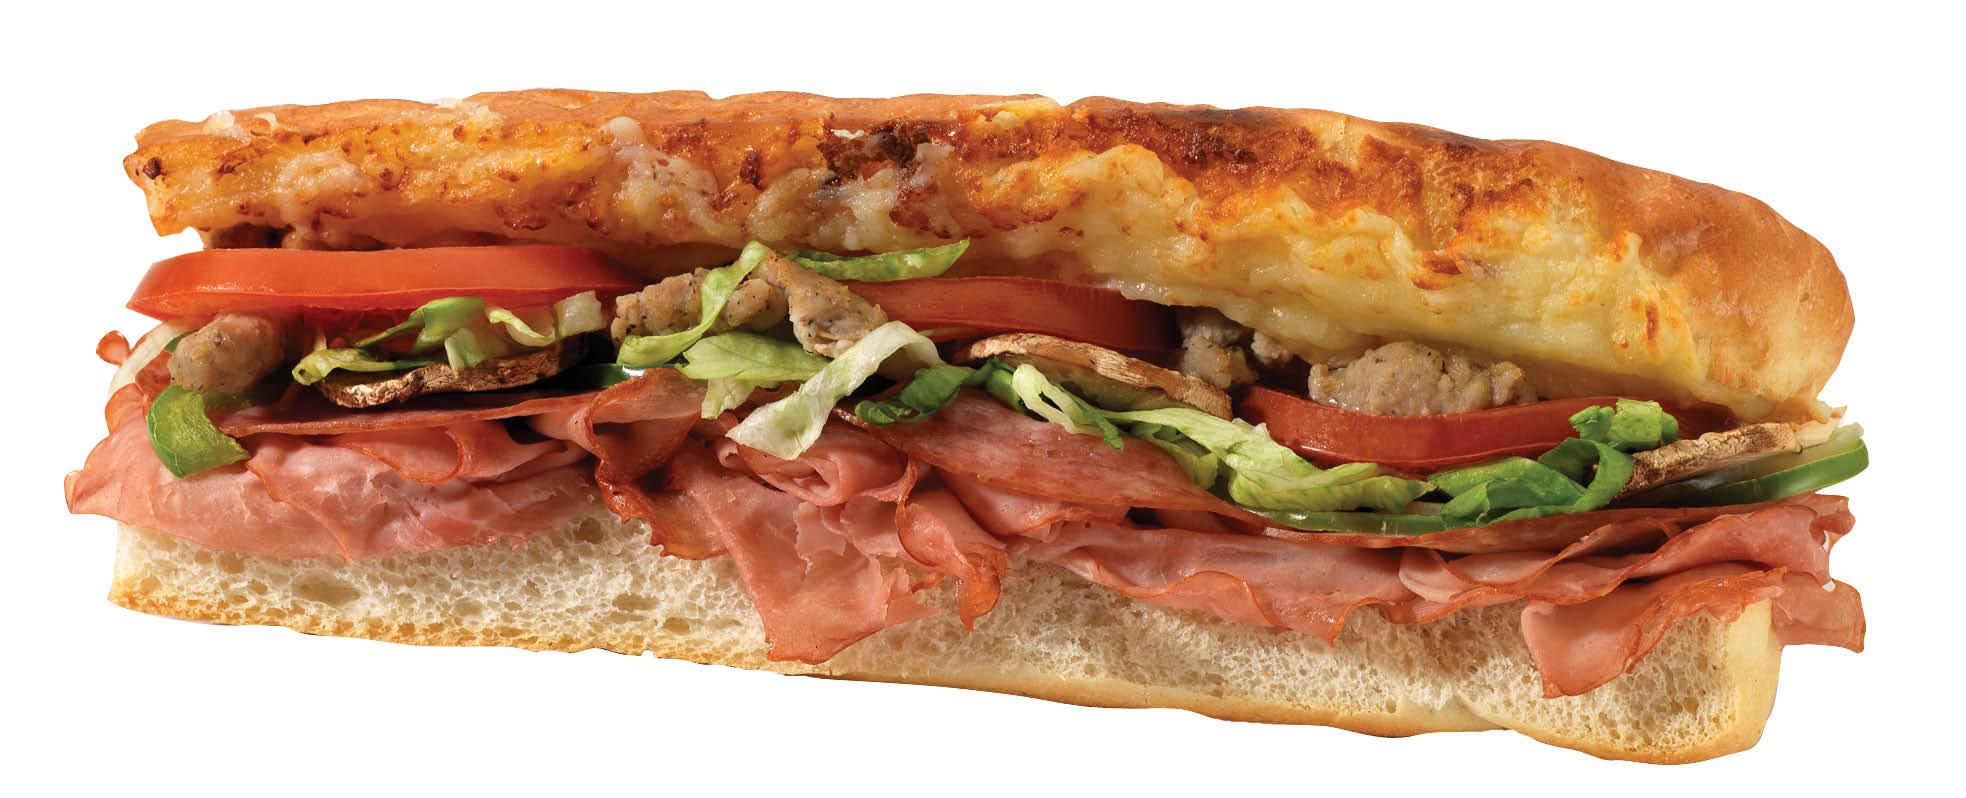 photo of Italian sub from Mancino's Pizza & Grinders in Brighton, MI